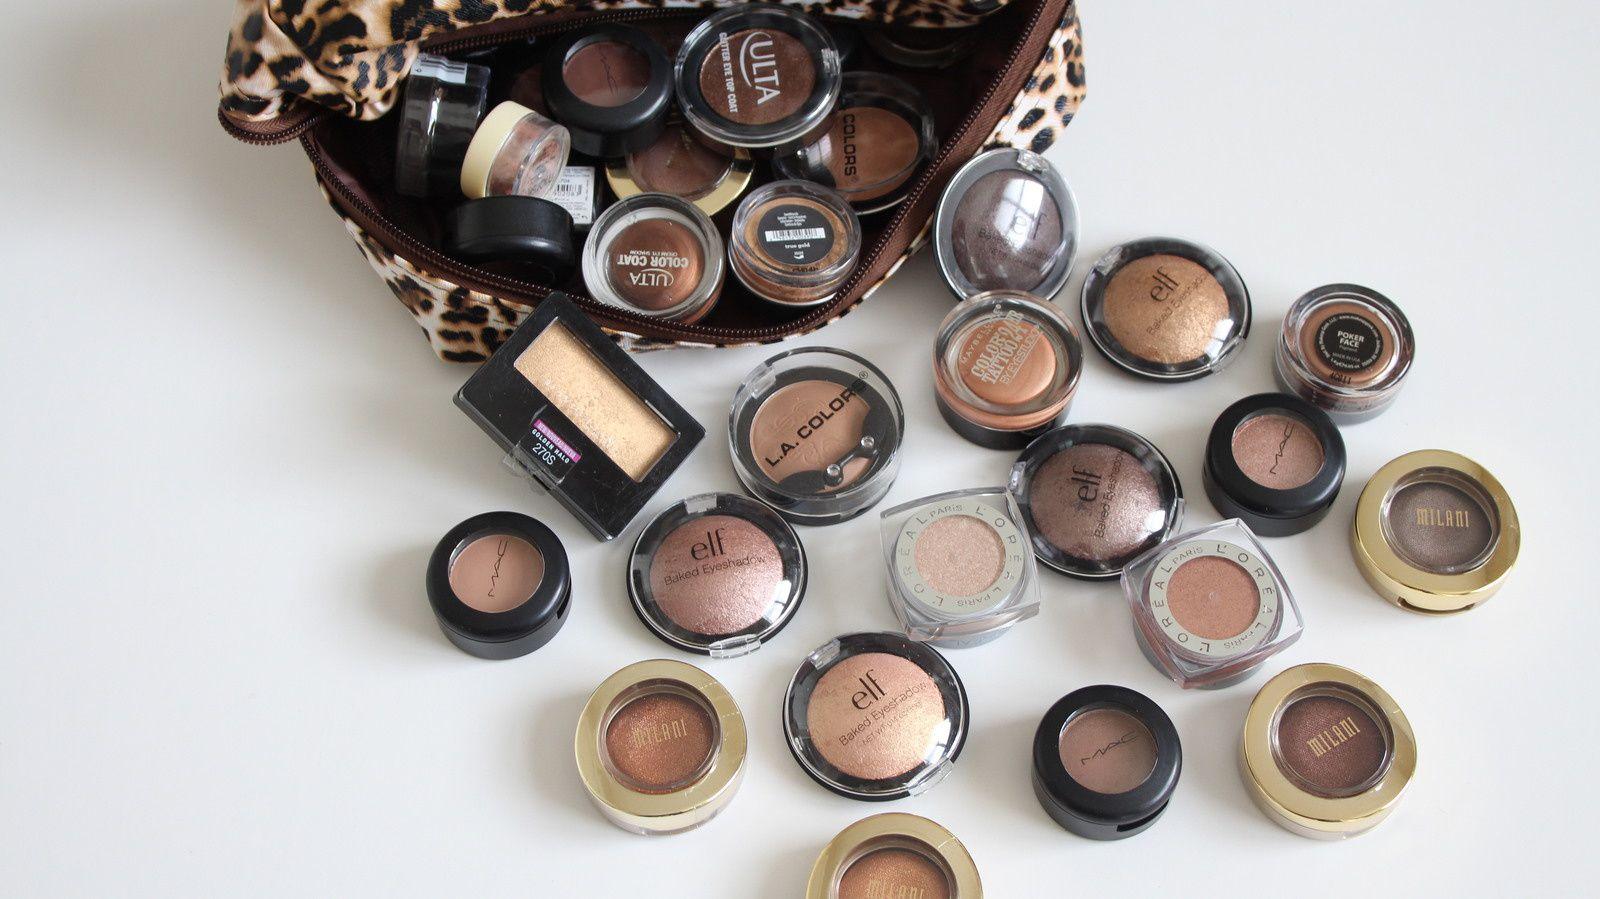 Single Eye Shadow Makeup Collection &amp&#x3B; Storage! 2017